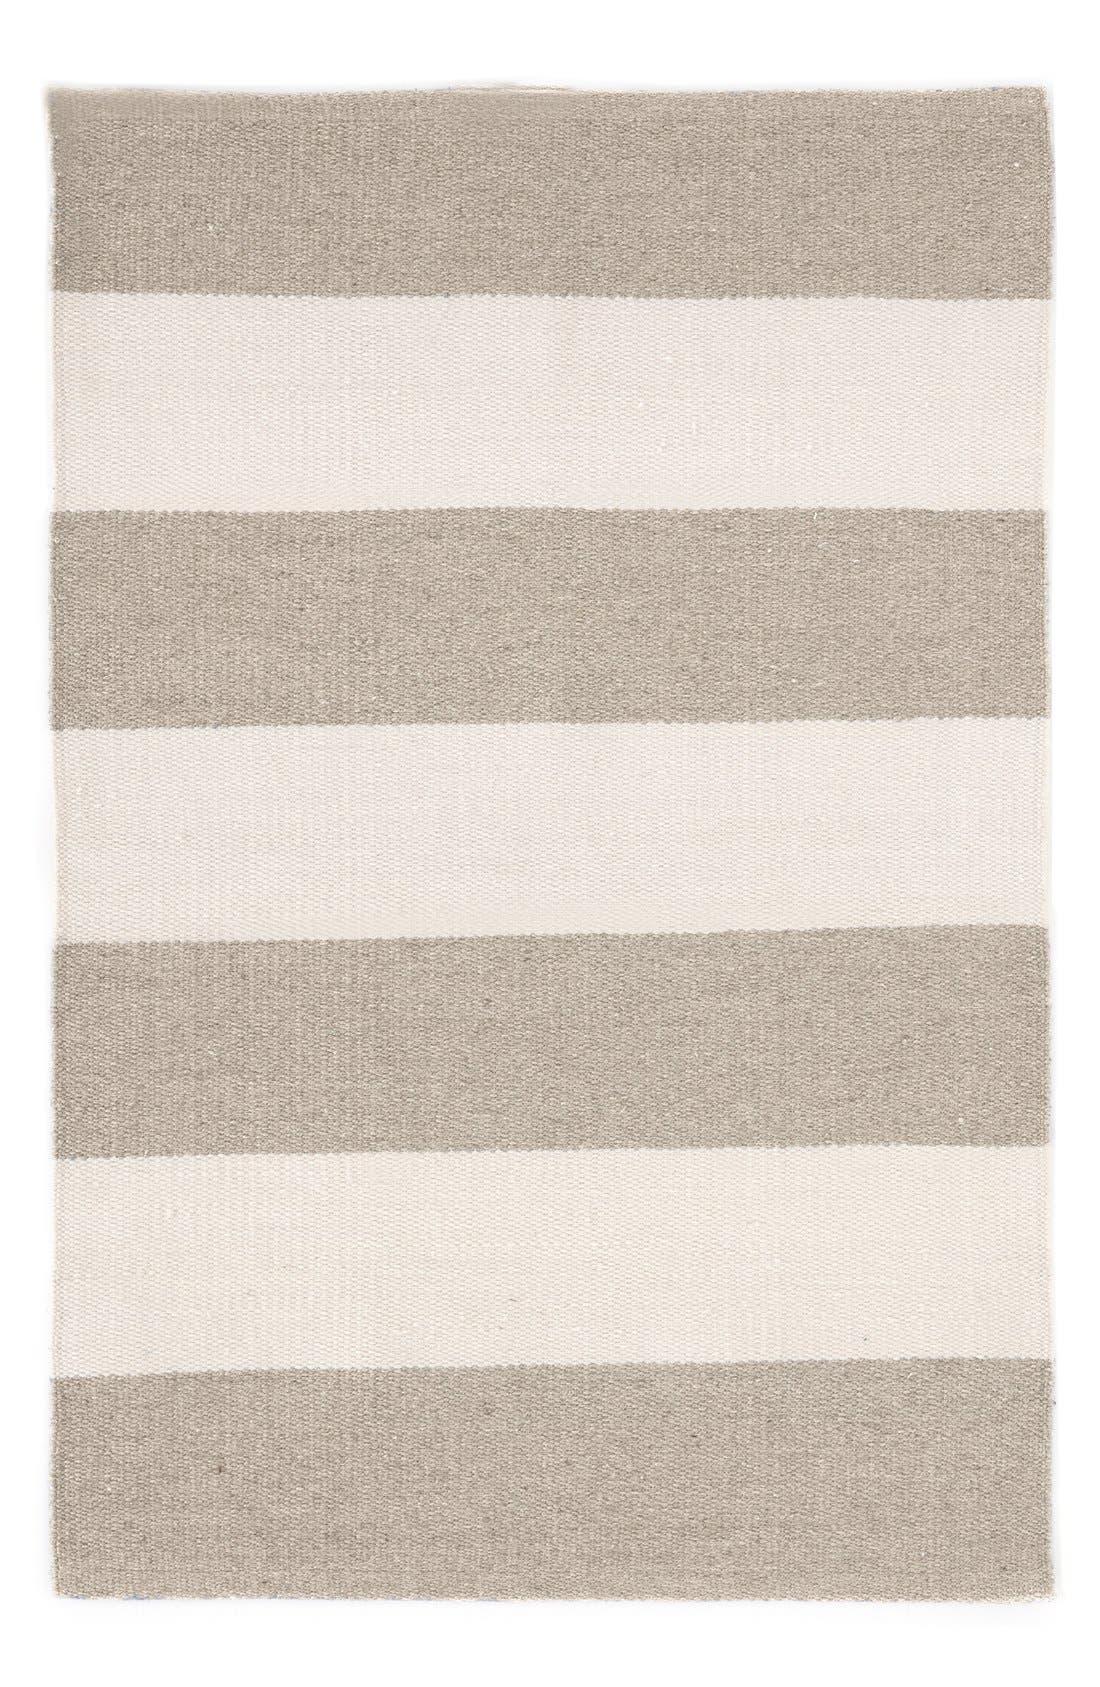 'Falls Village Stripe' Rug,                         Main,                         color, CEMENT